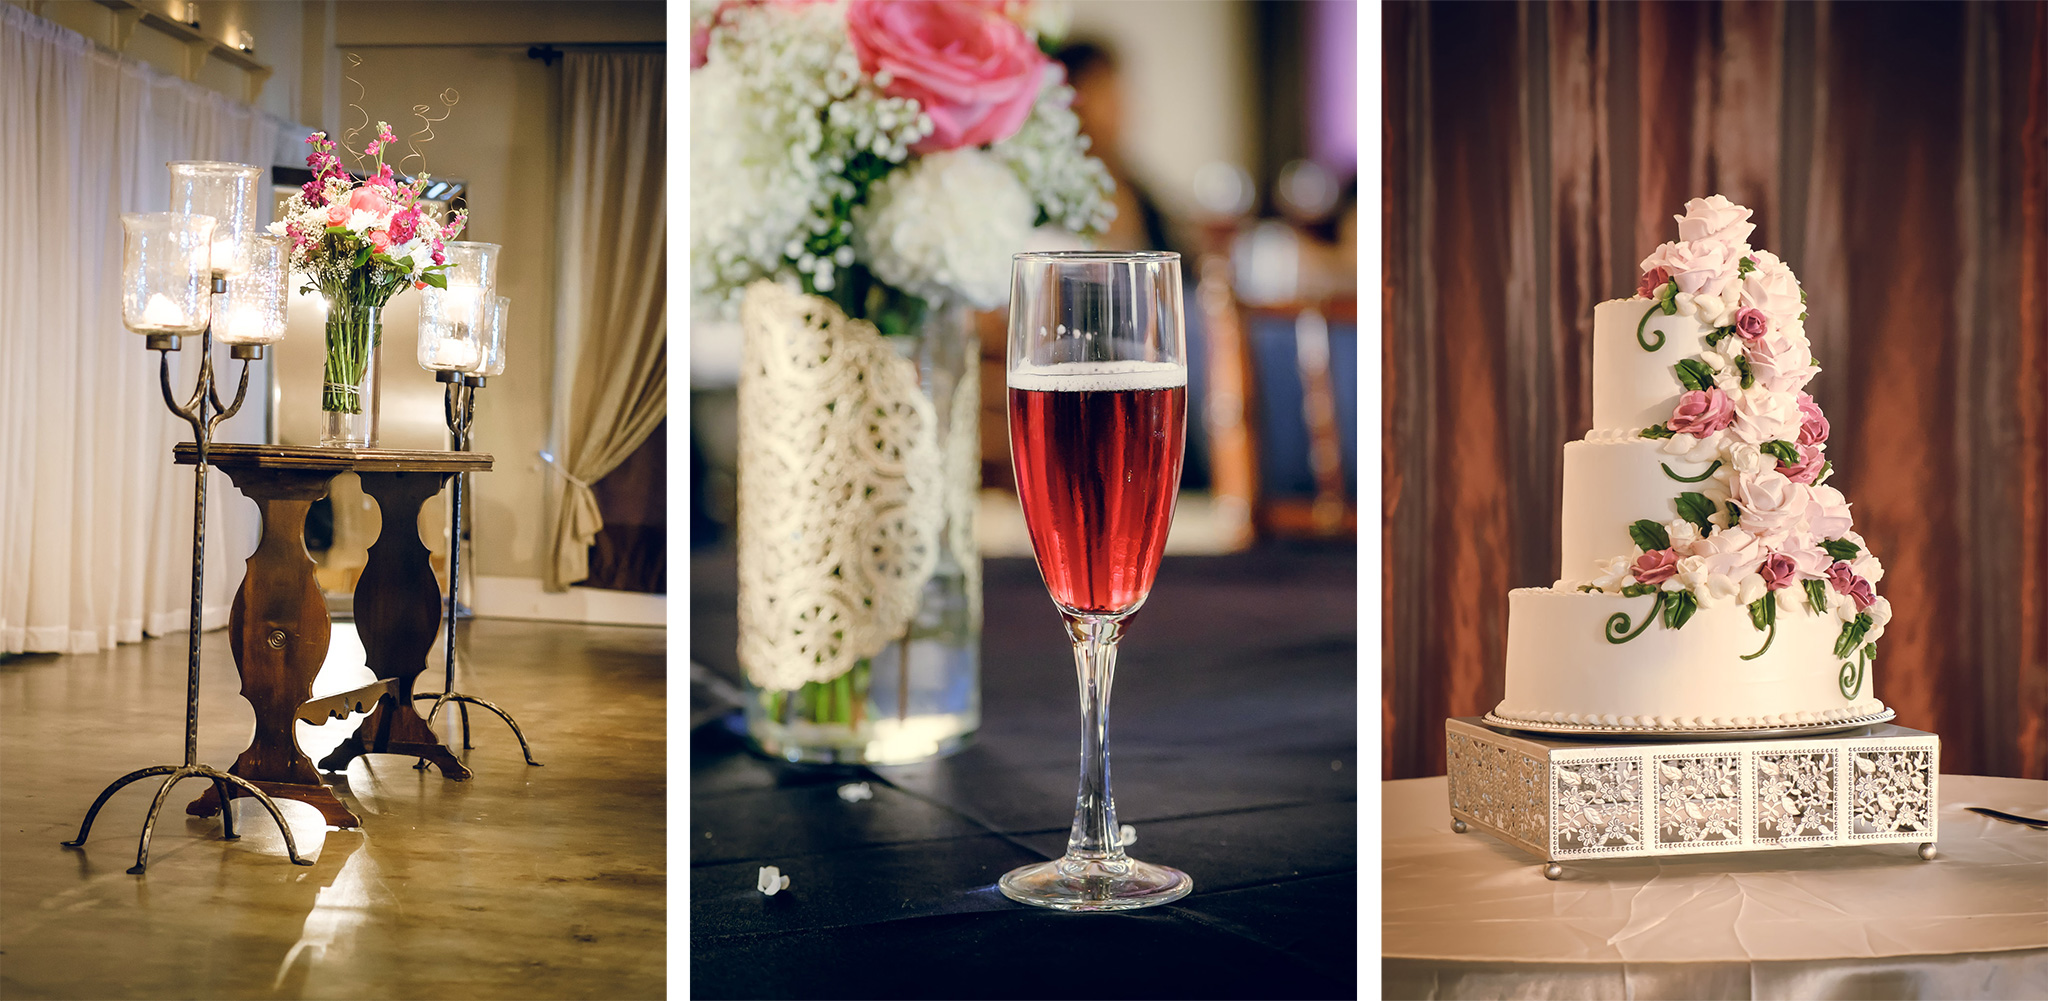 WestEndBallroom_WeddingDetails_AdrielHenderson.jpg